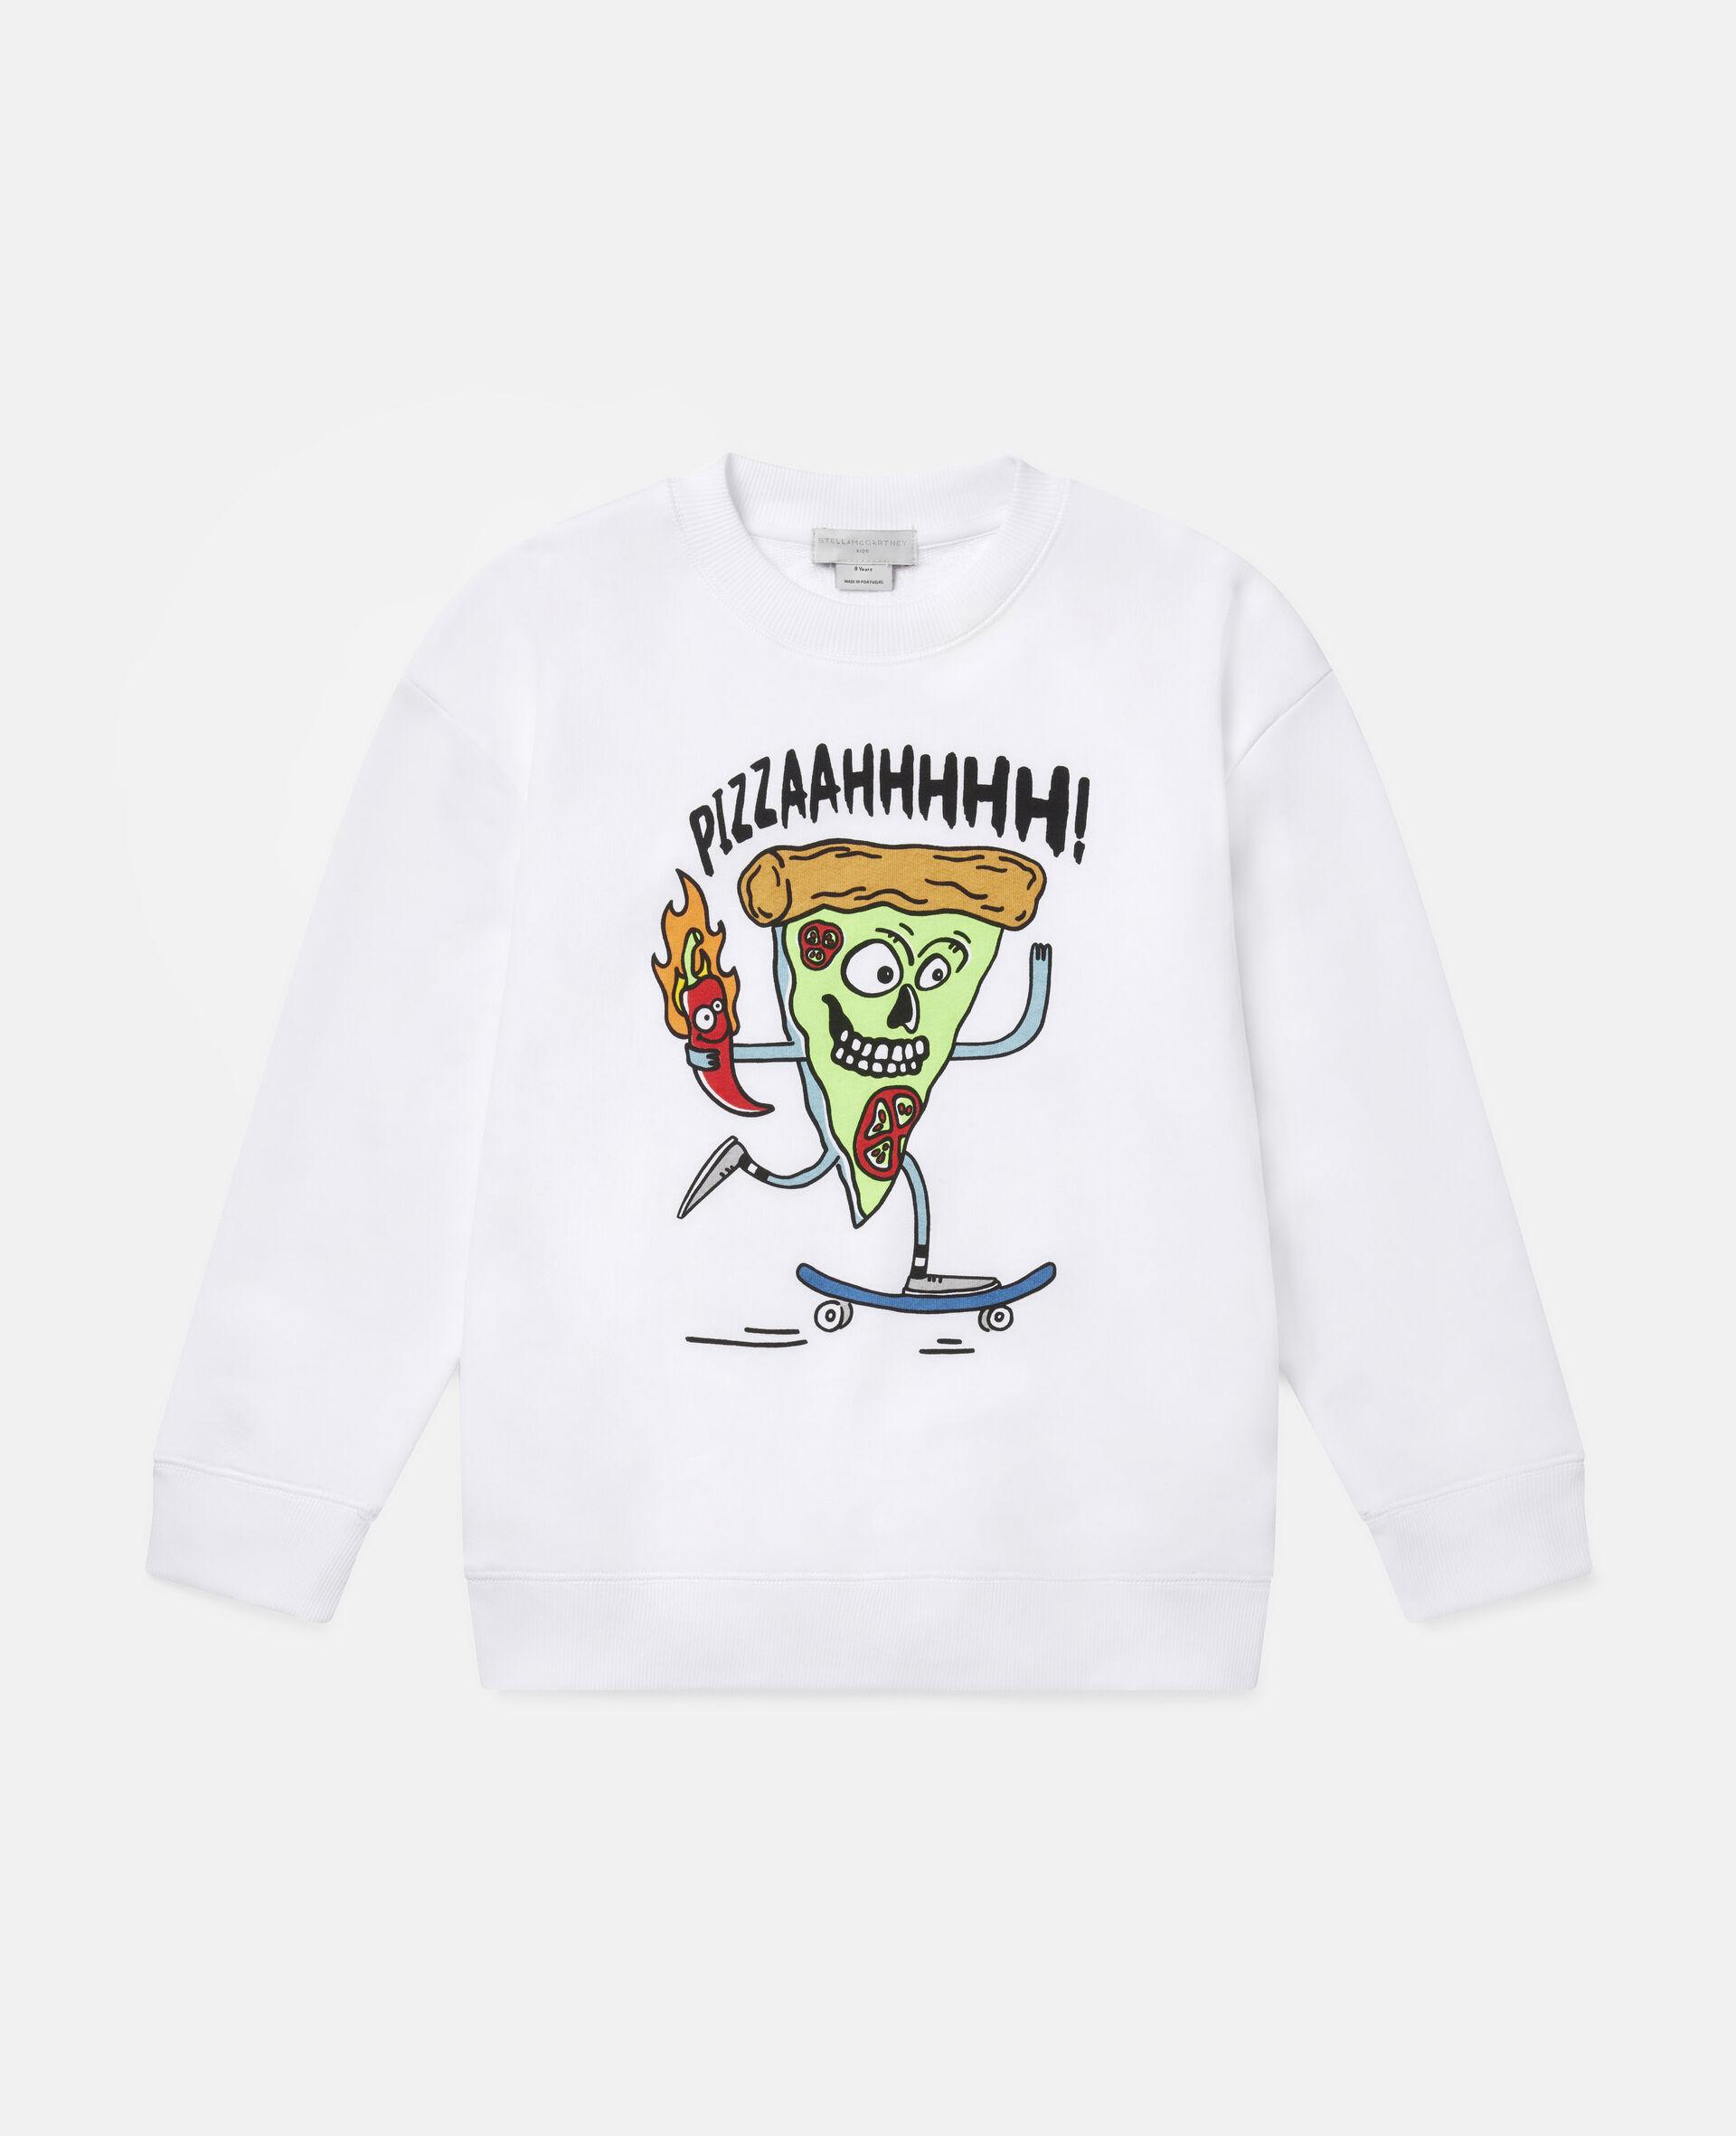 Fleece-Sweatshirt mit Pizza-Skater-Motiv-Weiß-large image number 0